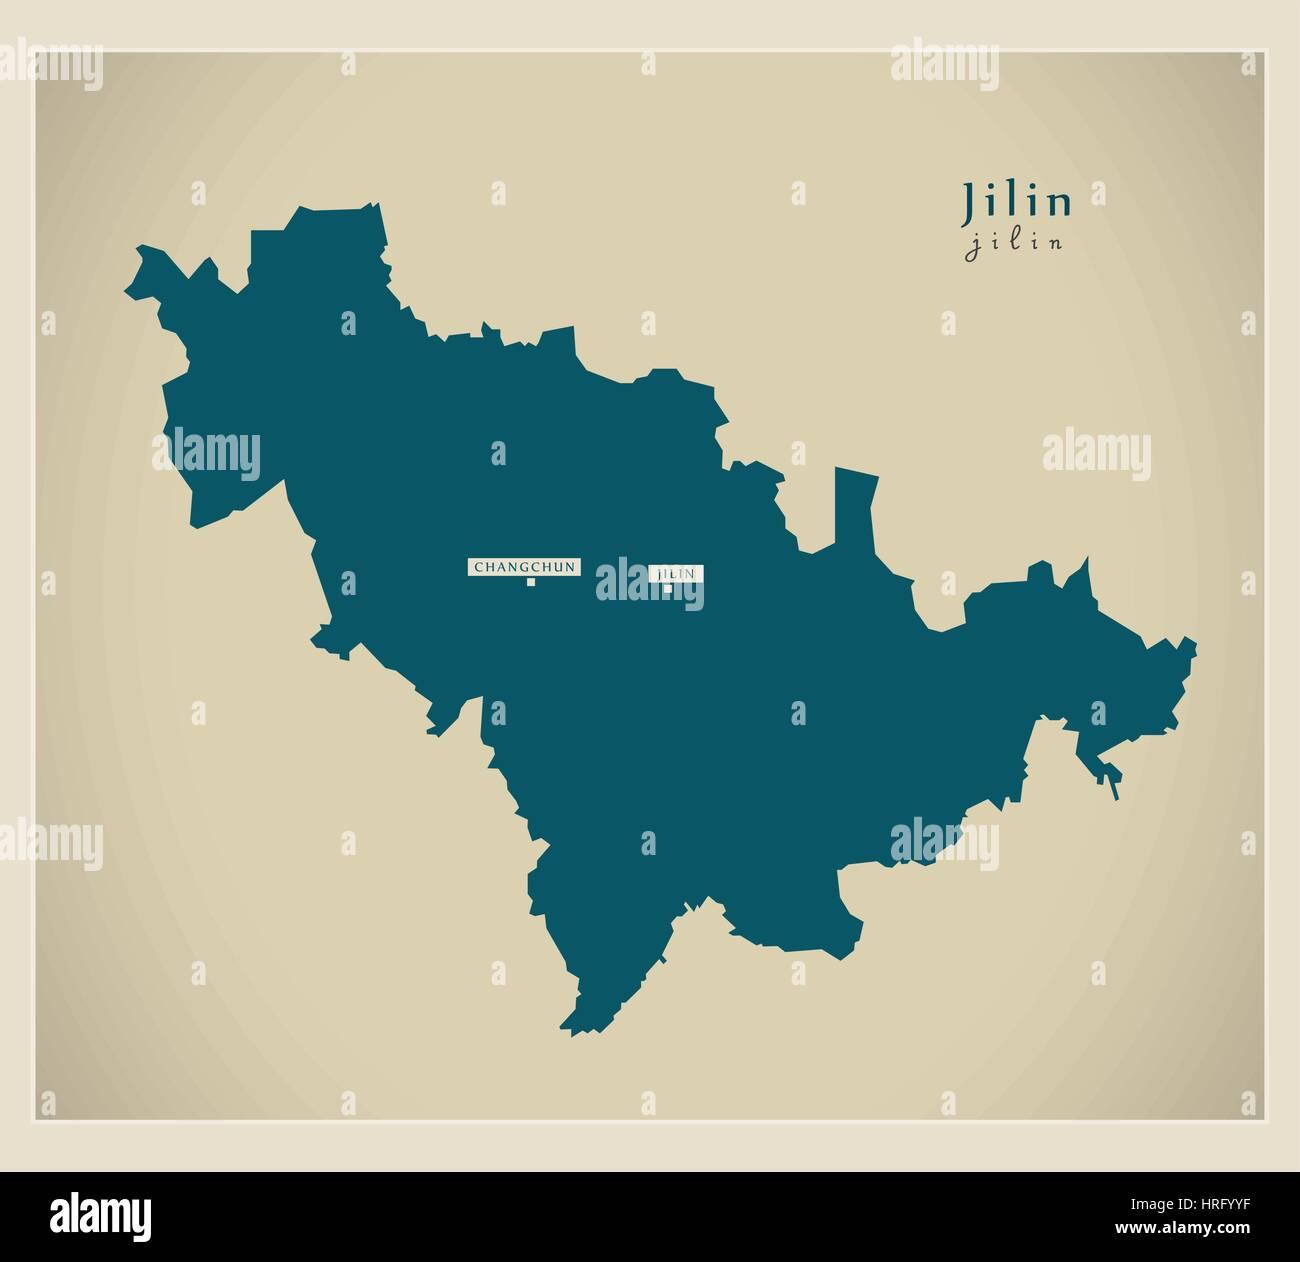 Modern Map - Jilin - Stock Image